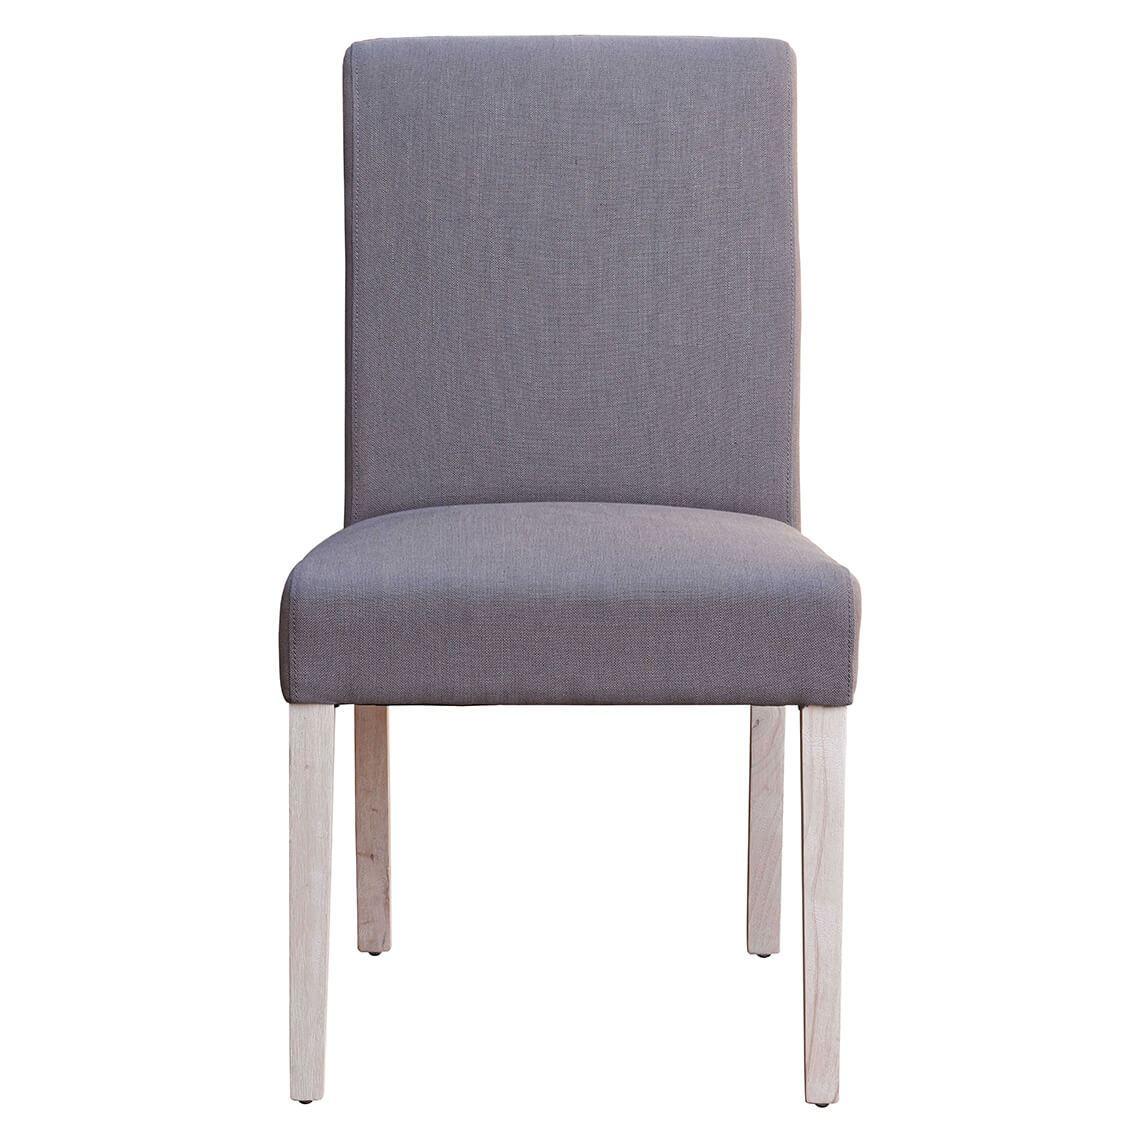 Andes Dining Chair Ella Grey White Wash Leg by Freedom